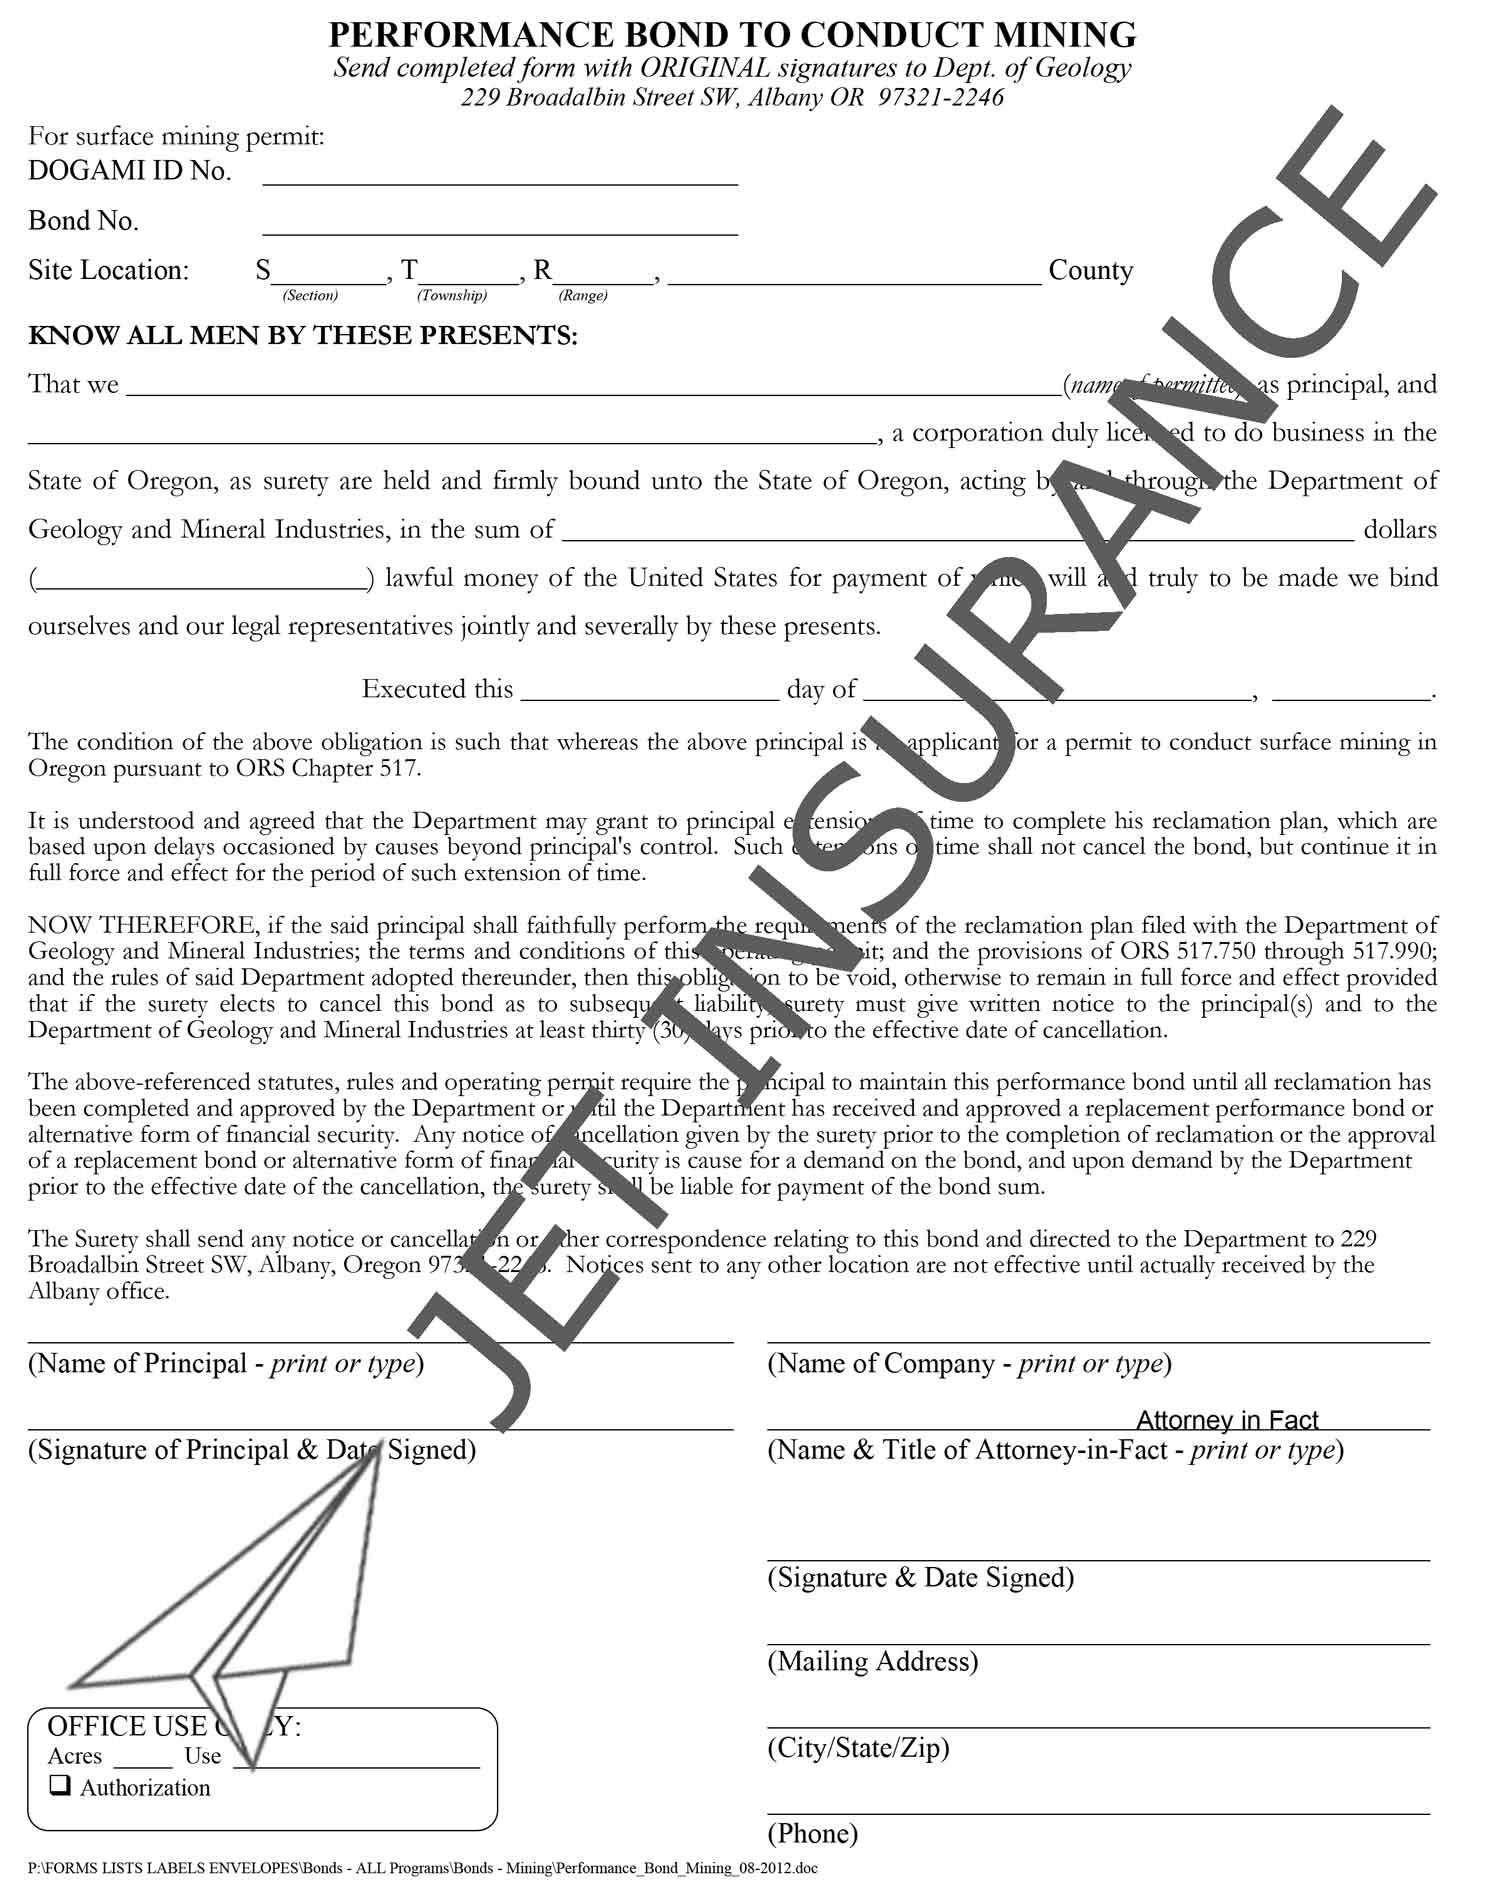 Oregon Surface Mining Permit Bond Form